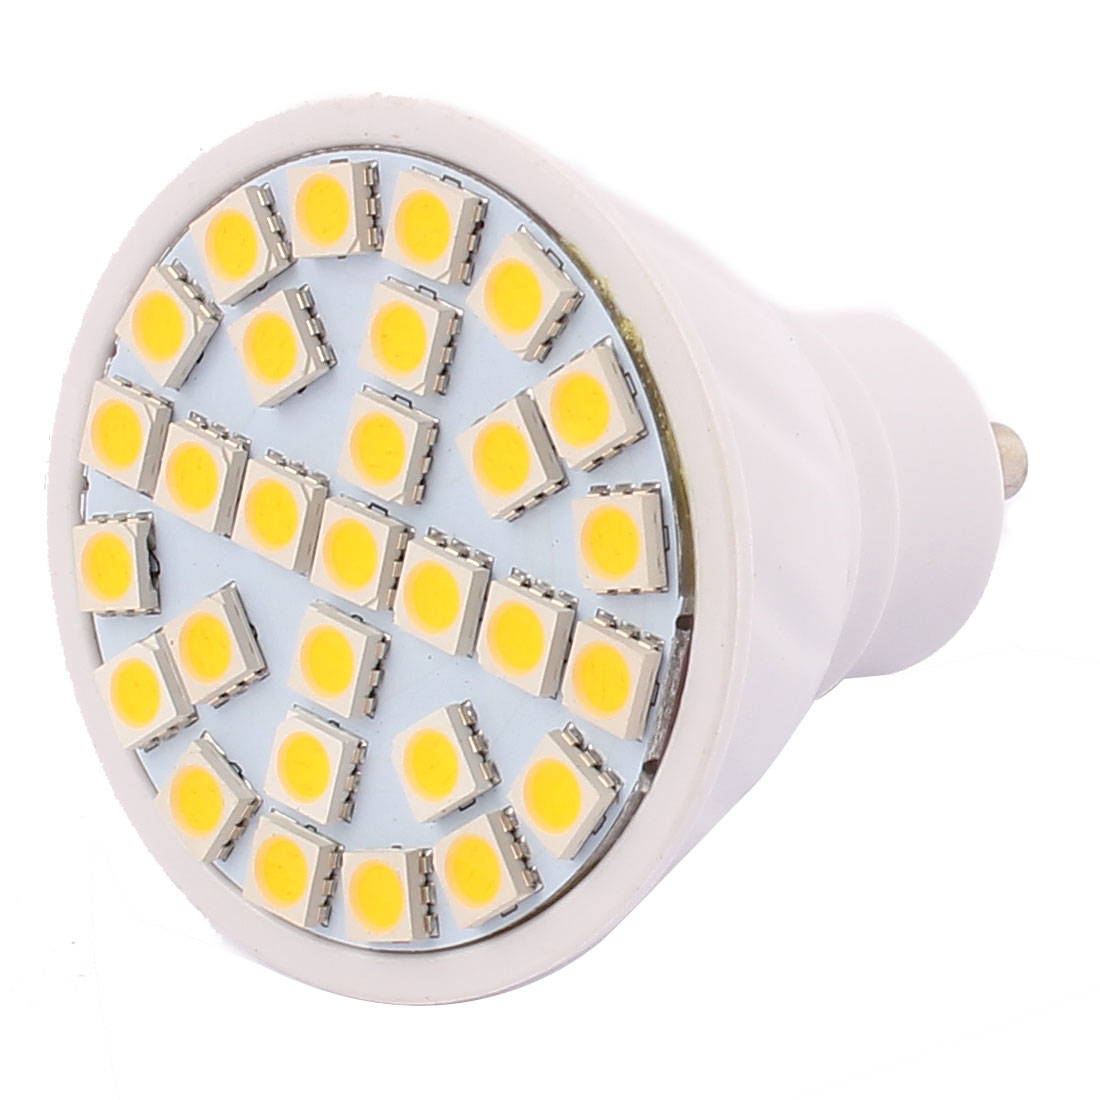 GU10 SMD5050 29 LEDs 5W Energy Saving LED Spotlight Lamp Bulb Warm White AC 220V